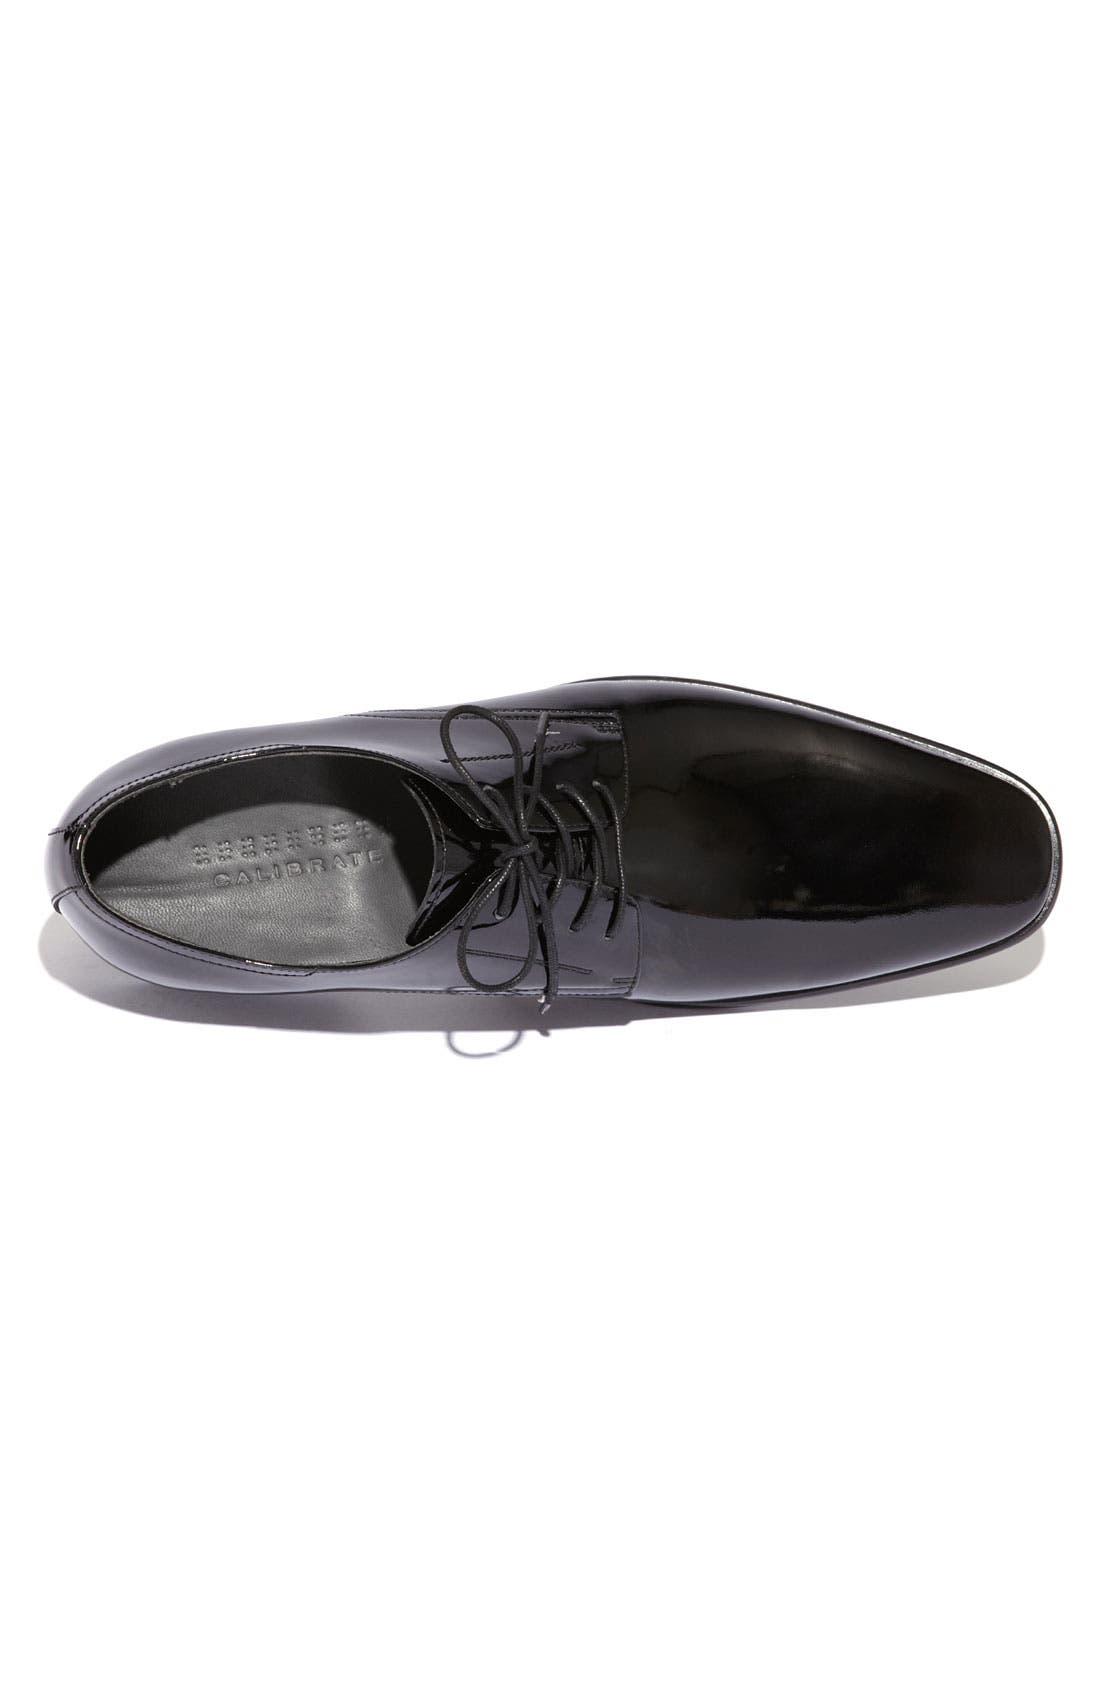 Alternate Image 3  - Calibrate 'Oscar' Patent Leather Dress Shoe (Men)